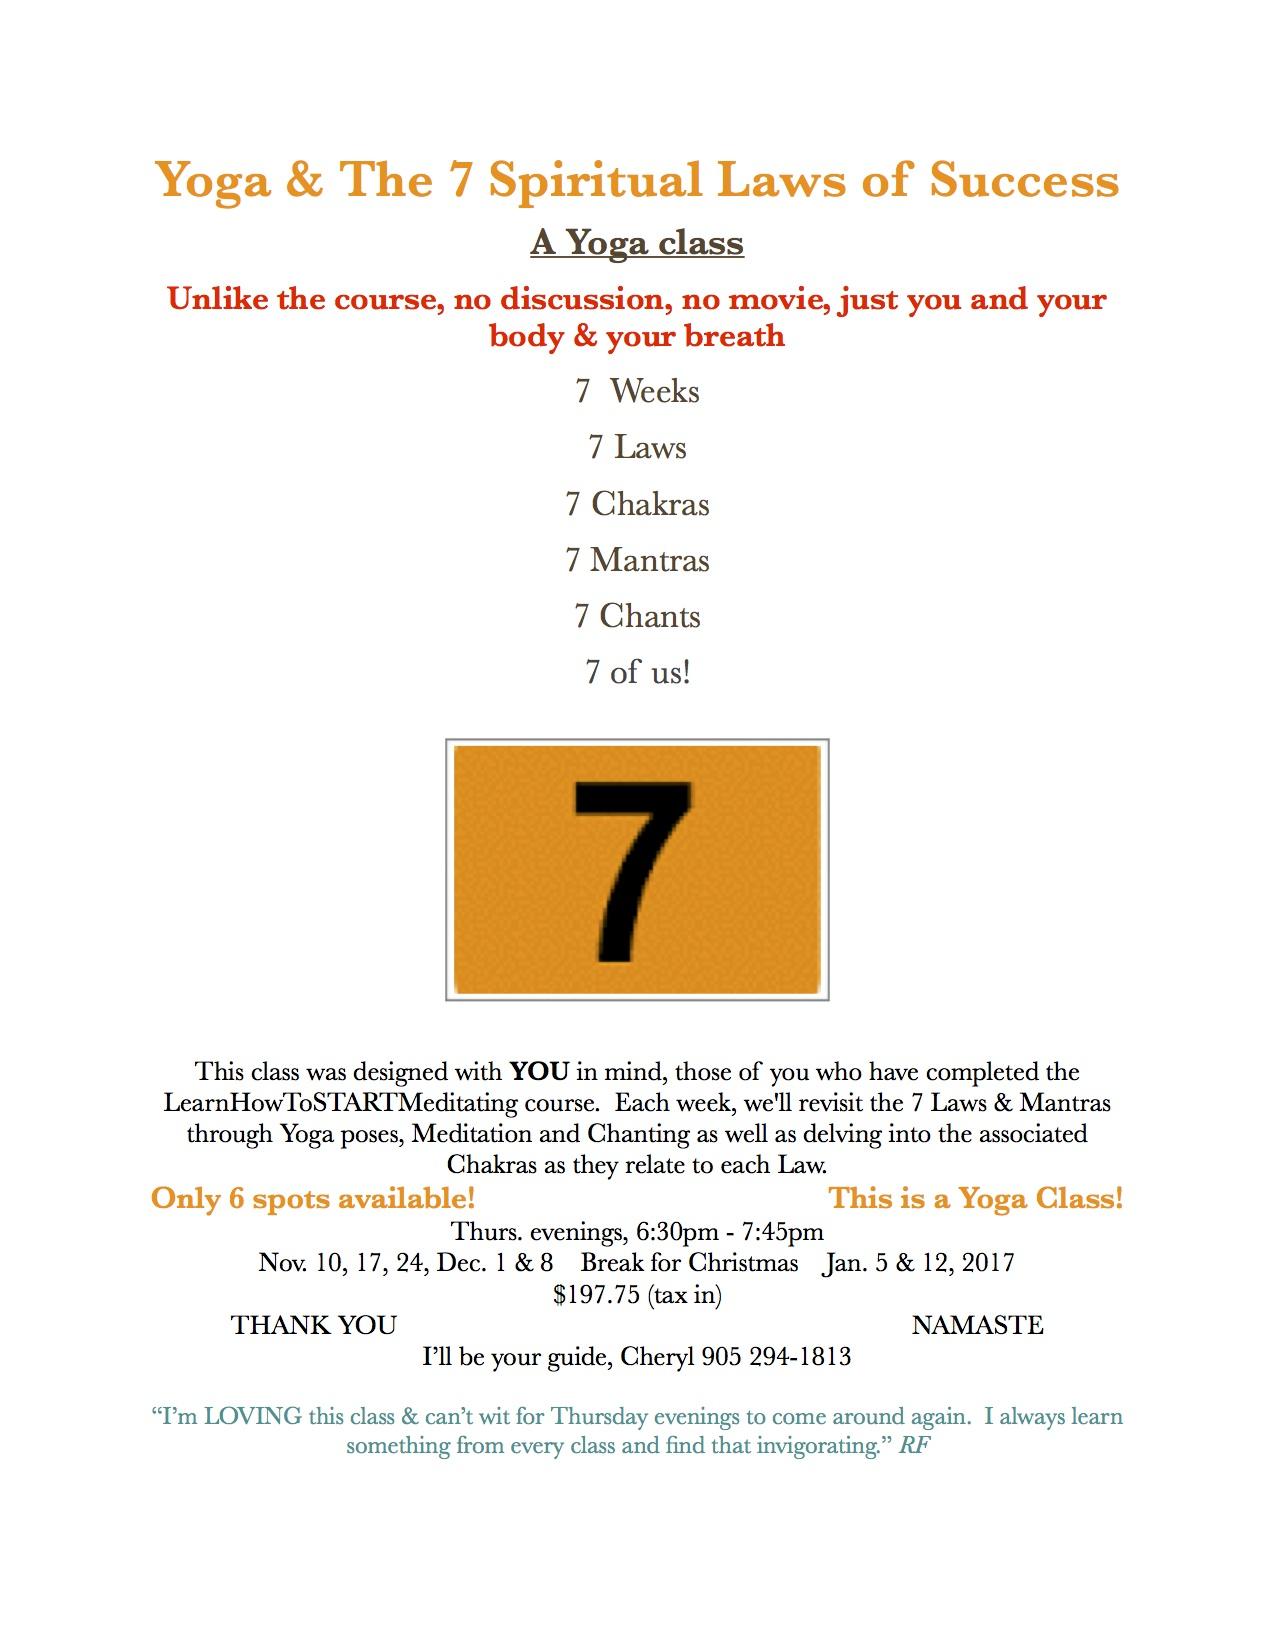 Yoga&The7SLOS